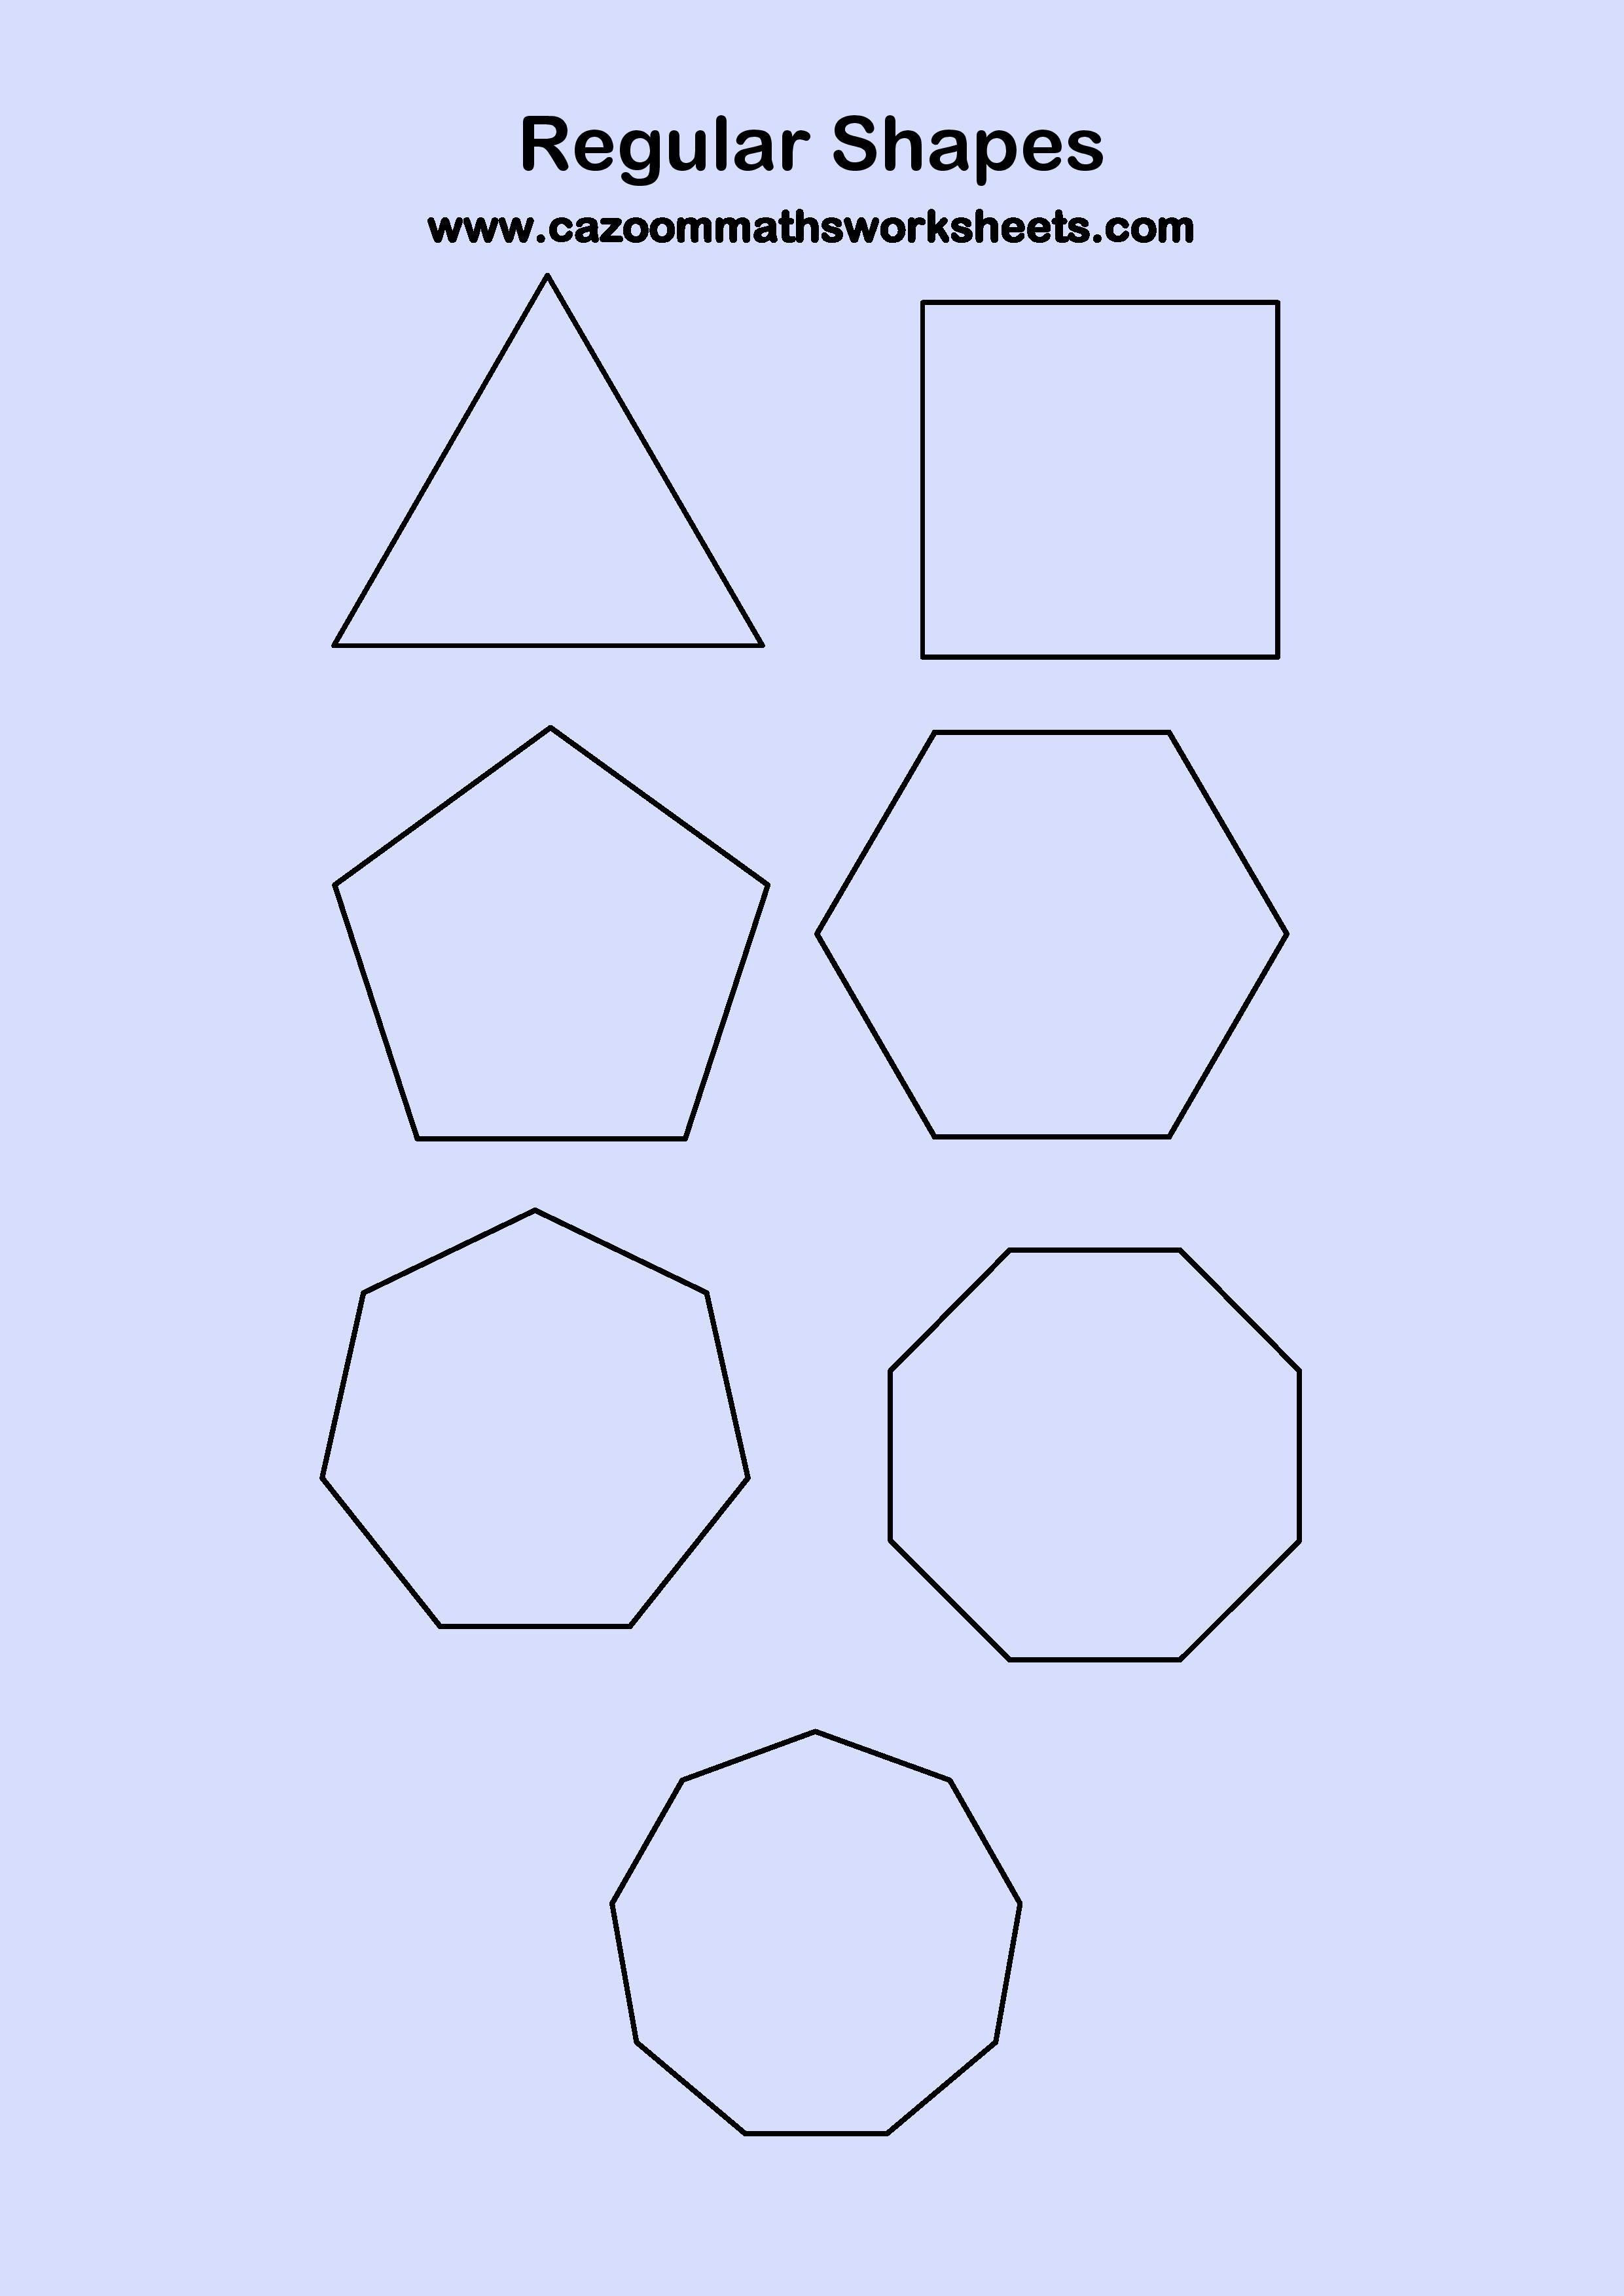 Worksheet Identifying Simple Shapes